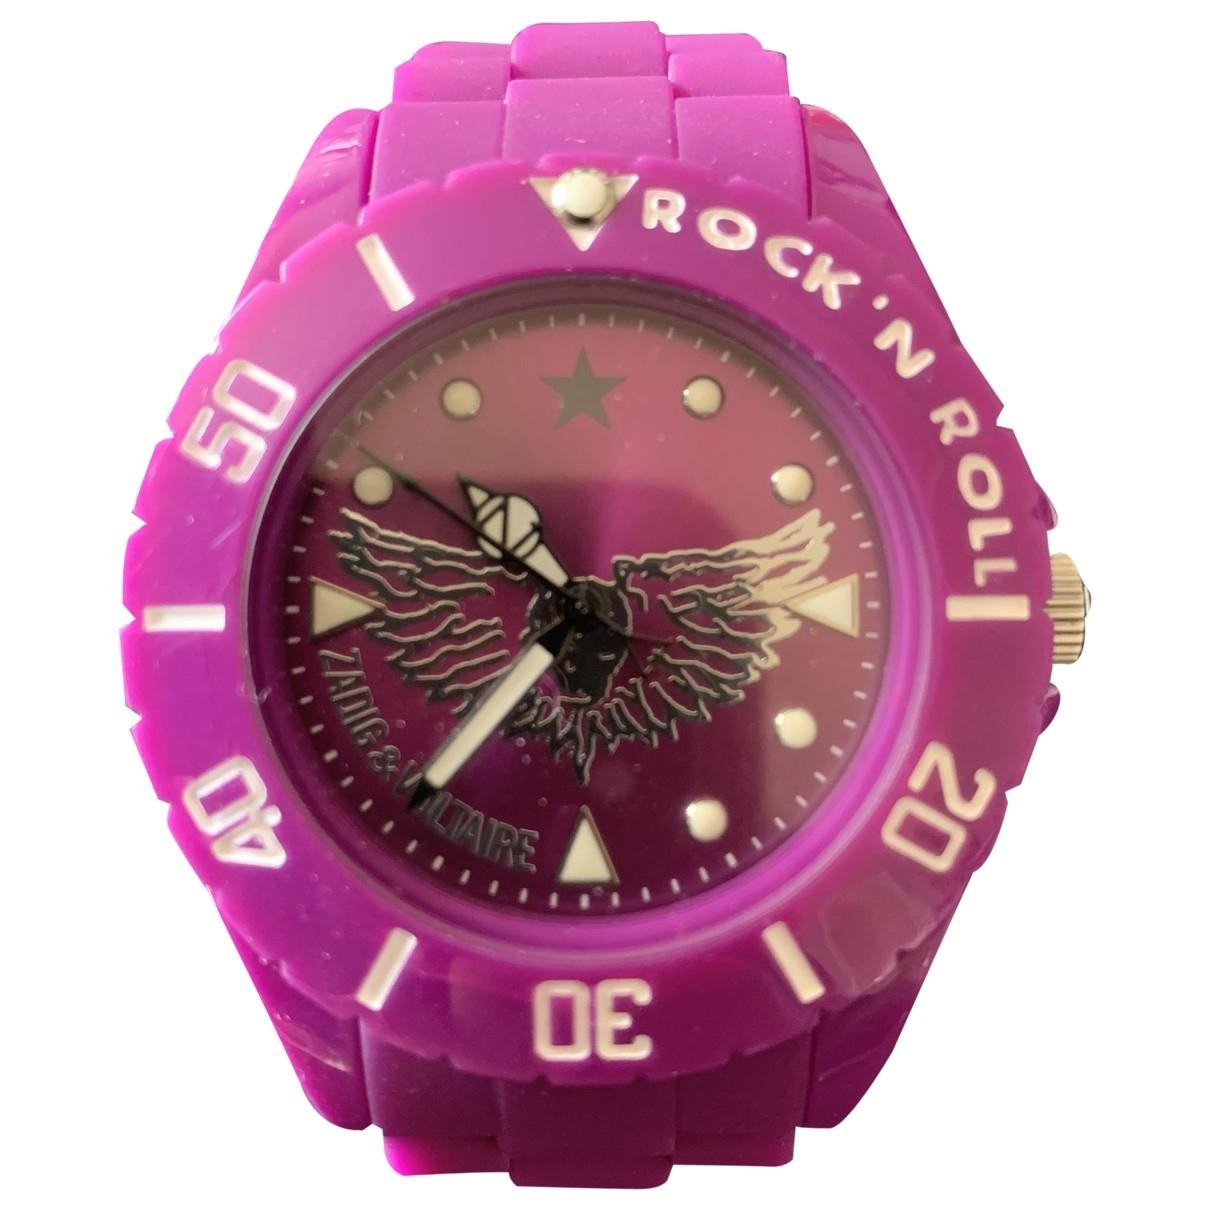 Reloj Spring Summer 2019 Zadig & Voltaire